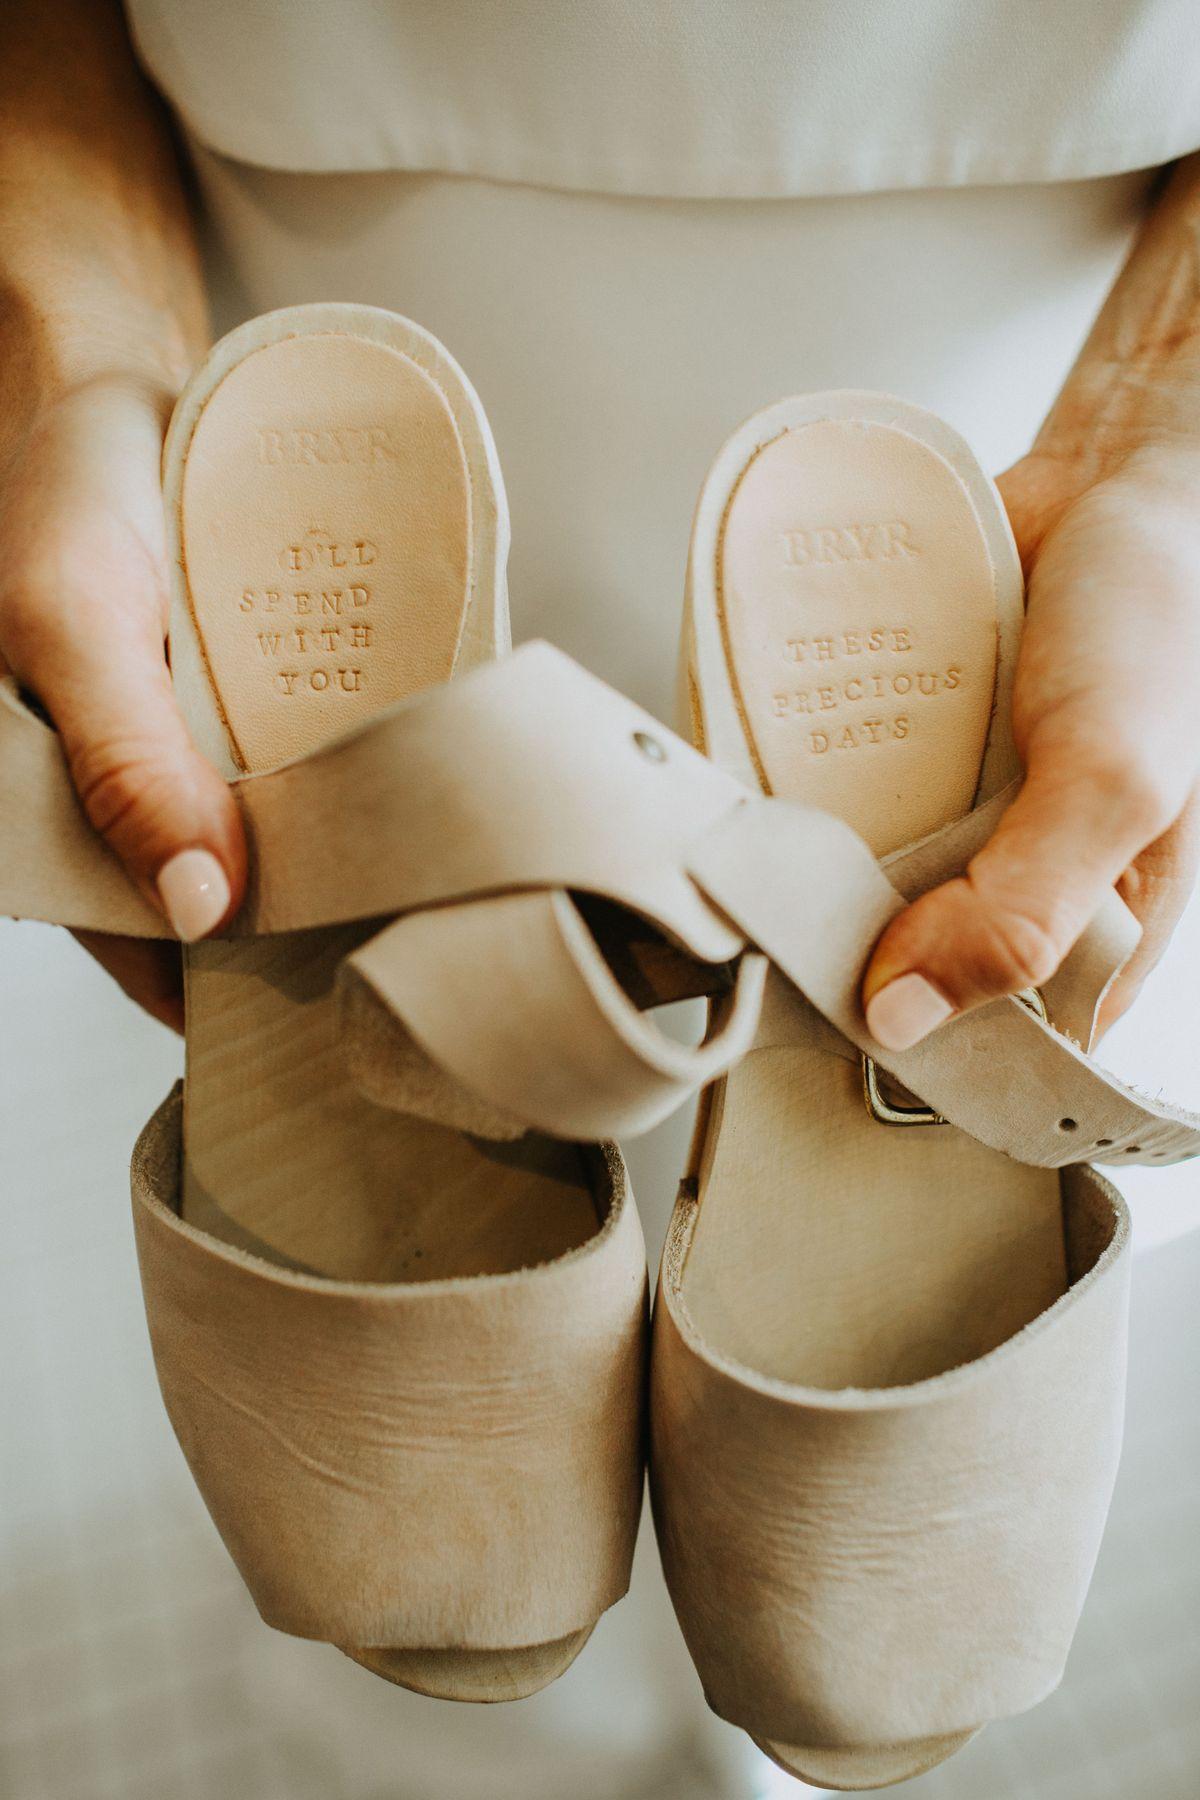 anne-sams-tillery-place-wedding-in-austin-tx-0002.jpg